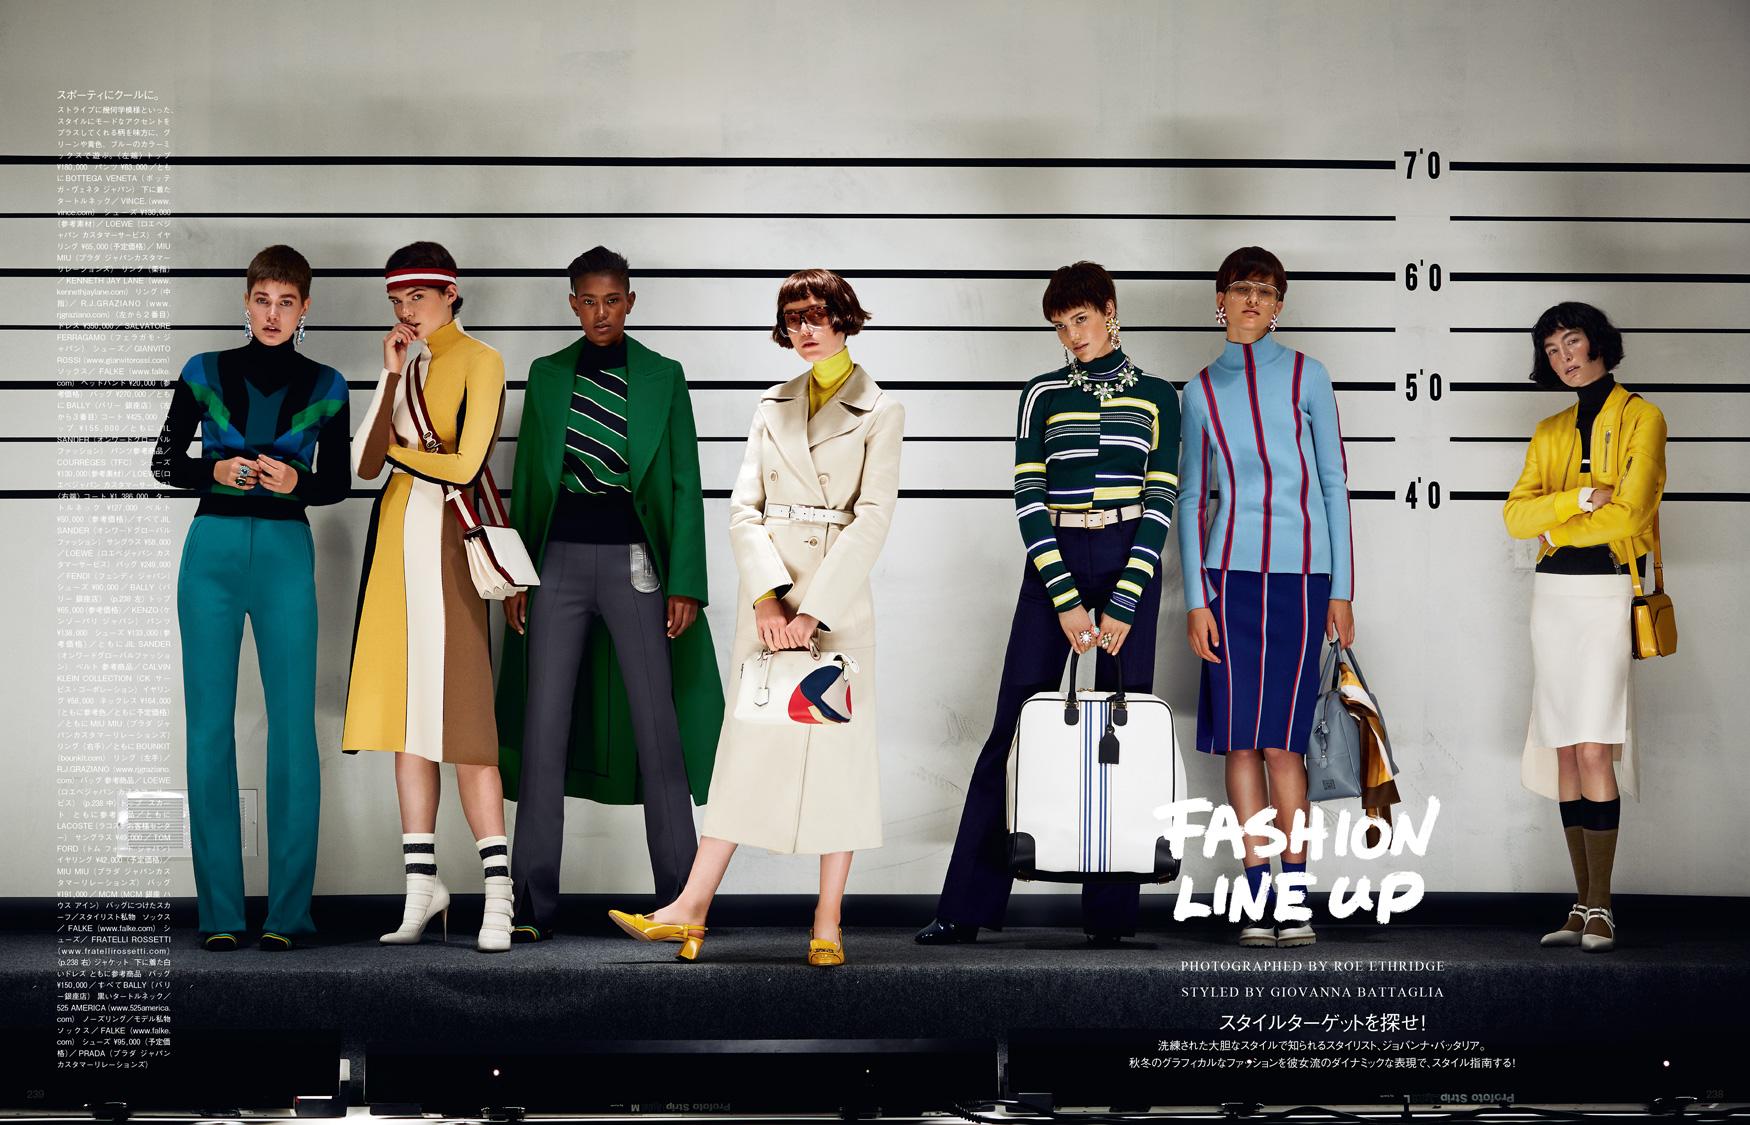 Giovanna-Battaglia-Vogue-Japan-November-2015-Fashion-Line-Up-1.jpg